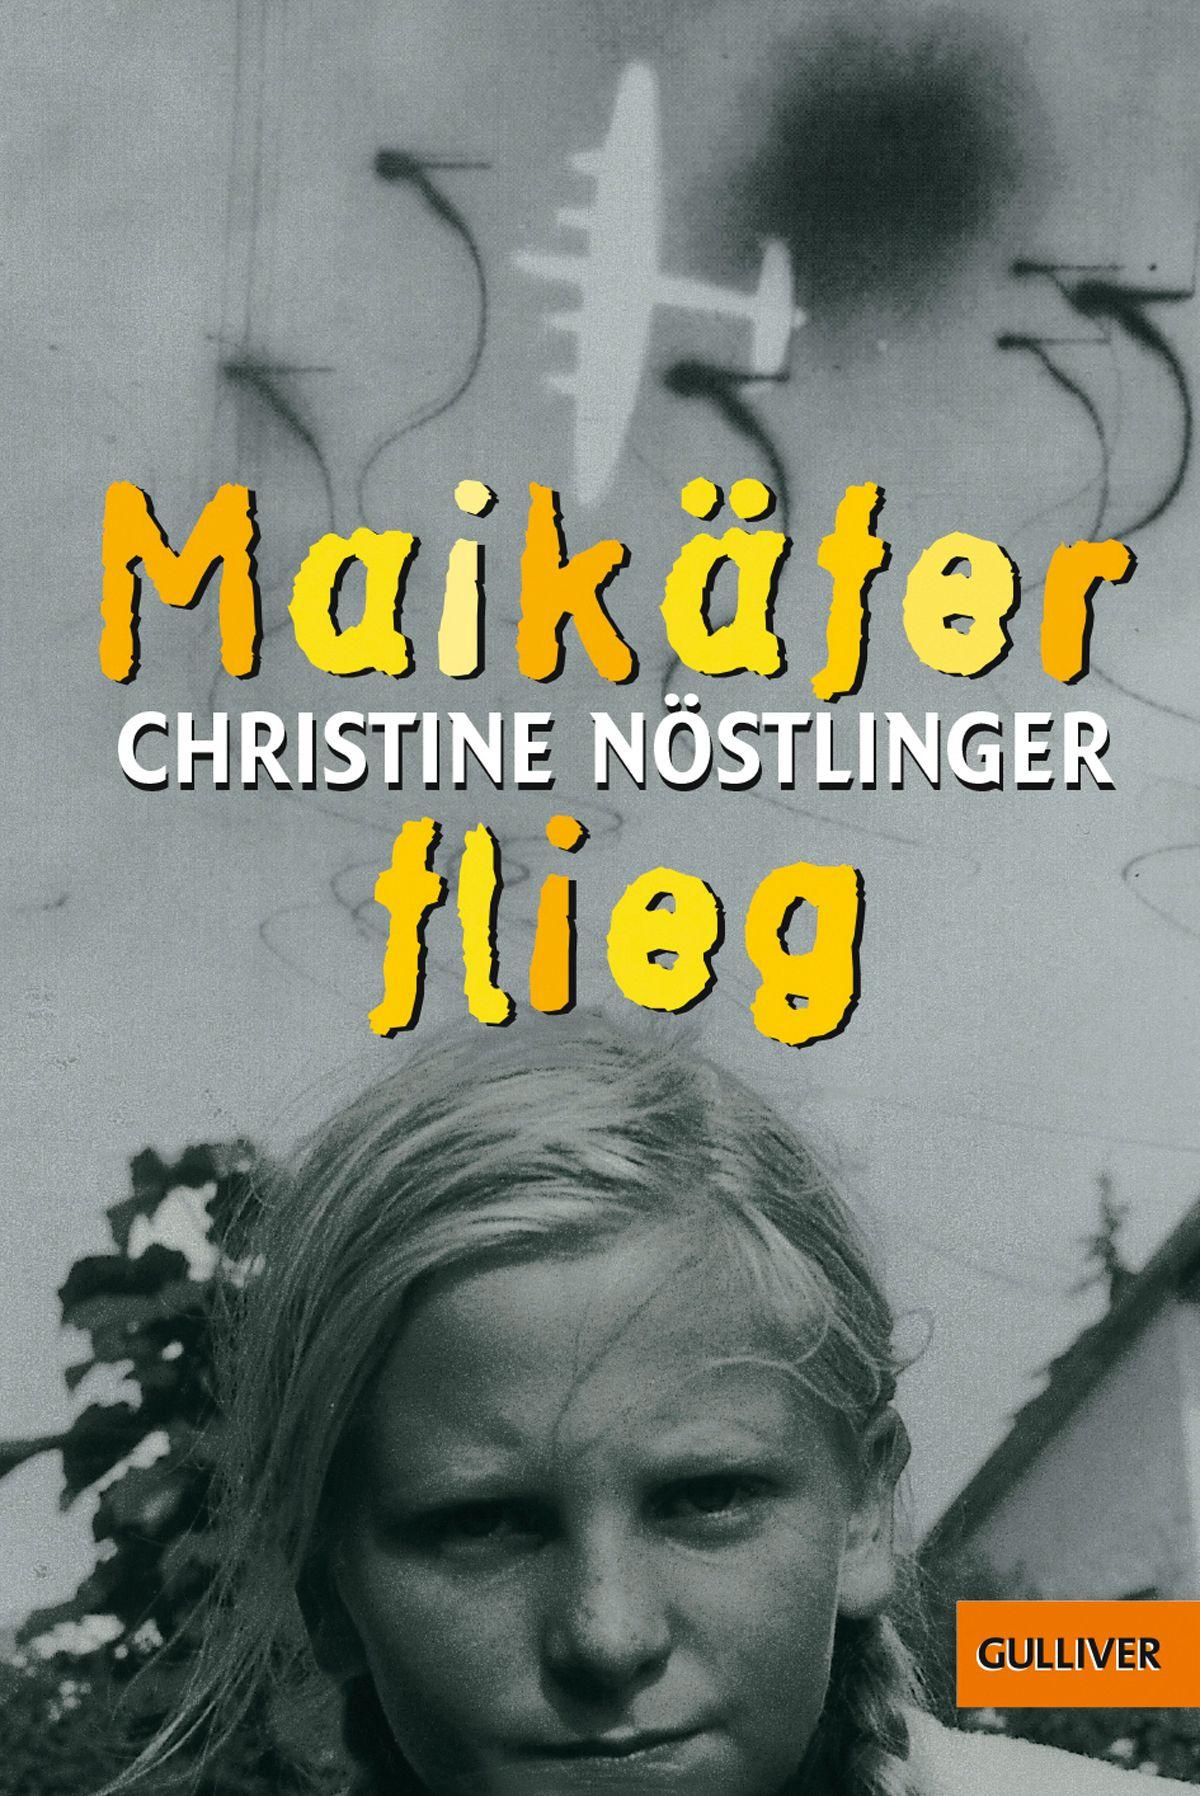 Christine Nöstlinger: Maikäfer flieg COVER